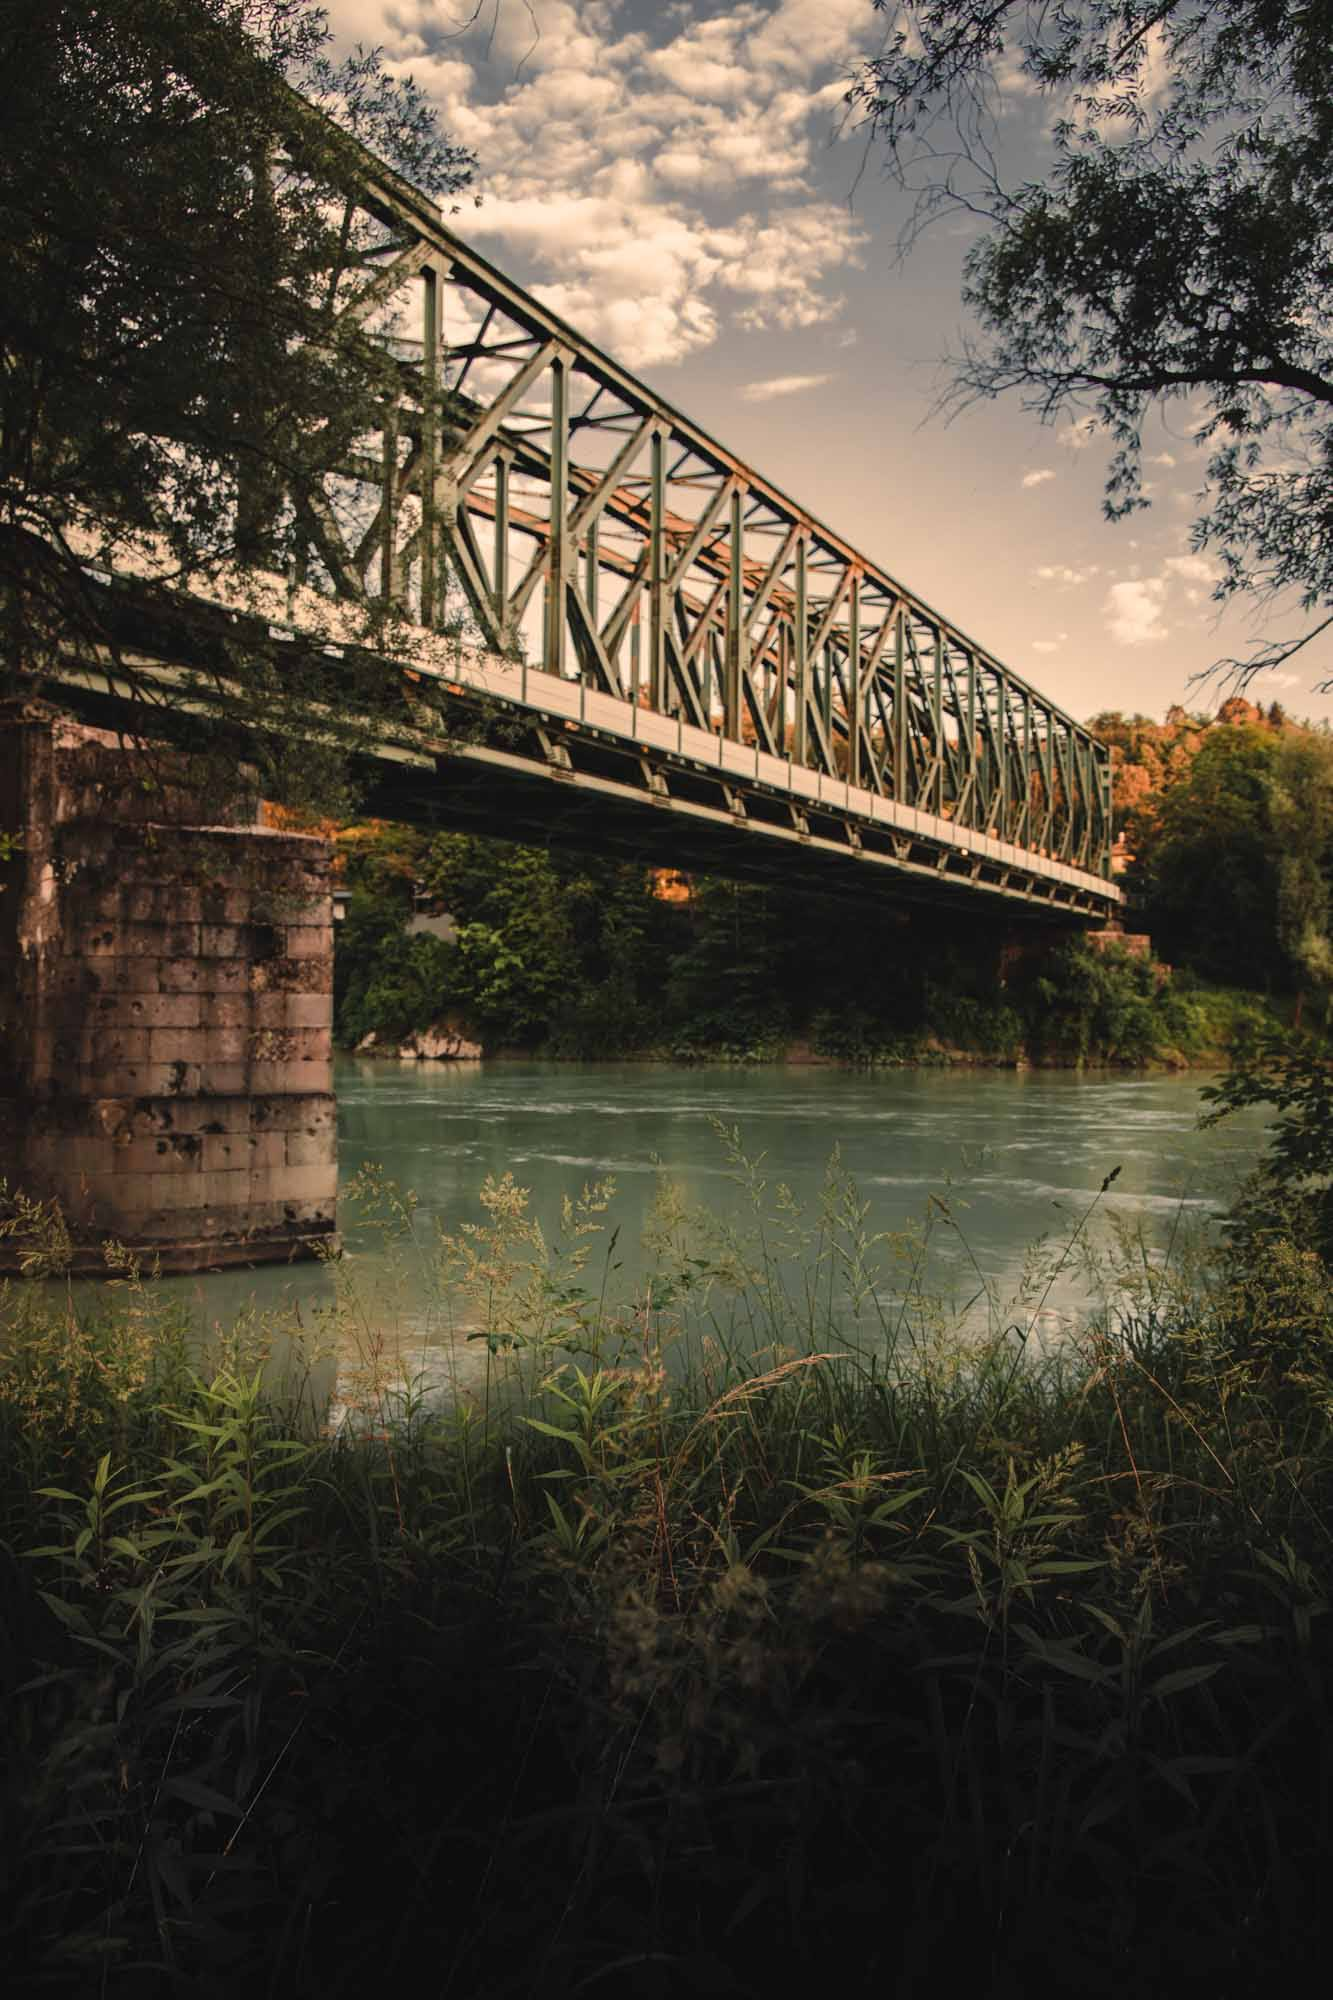 Eisenbahnbrücke Passau